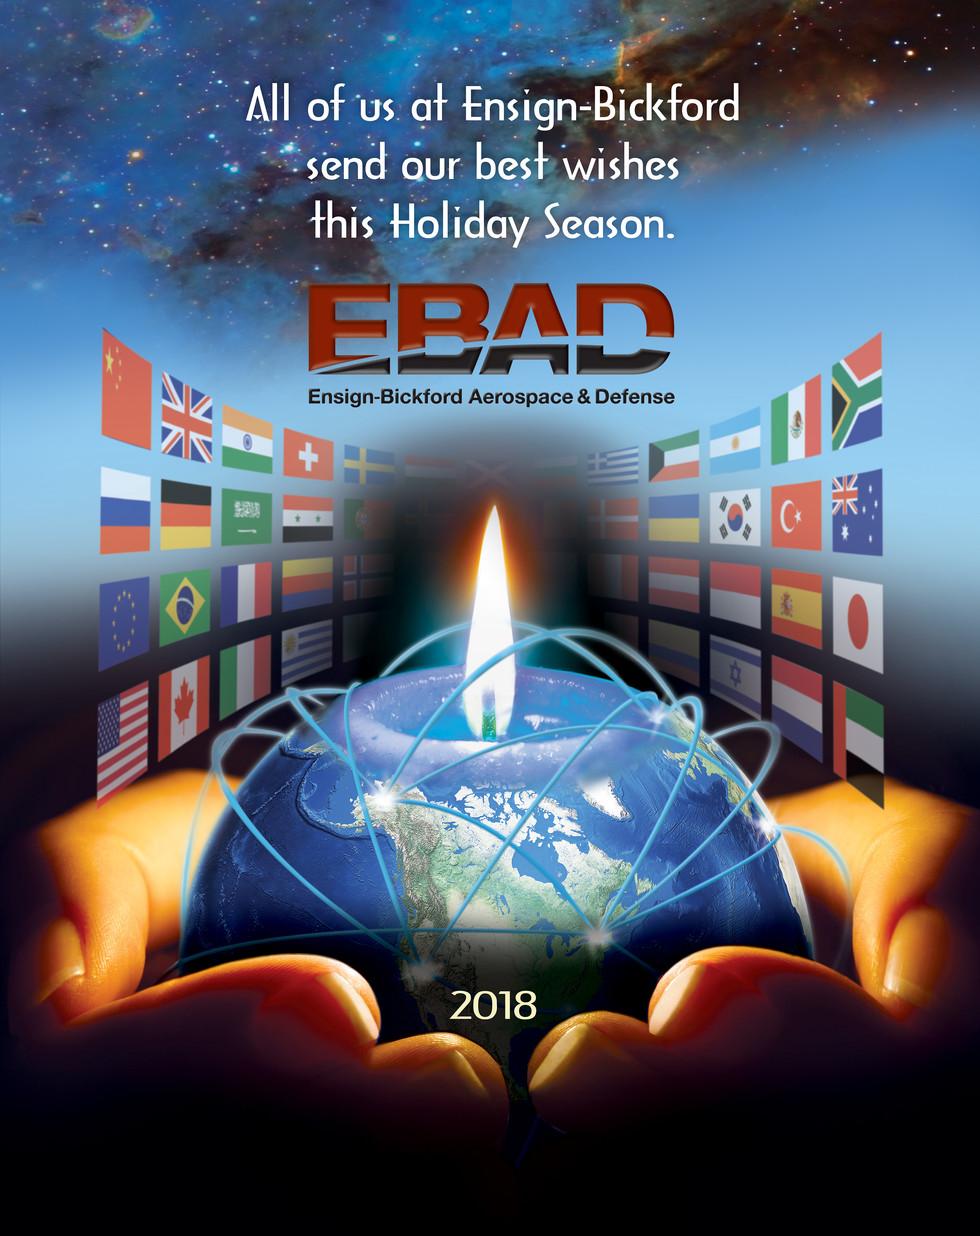 2018_EBAD-HolidayECardFinal12-19-18.jpg